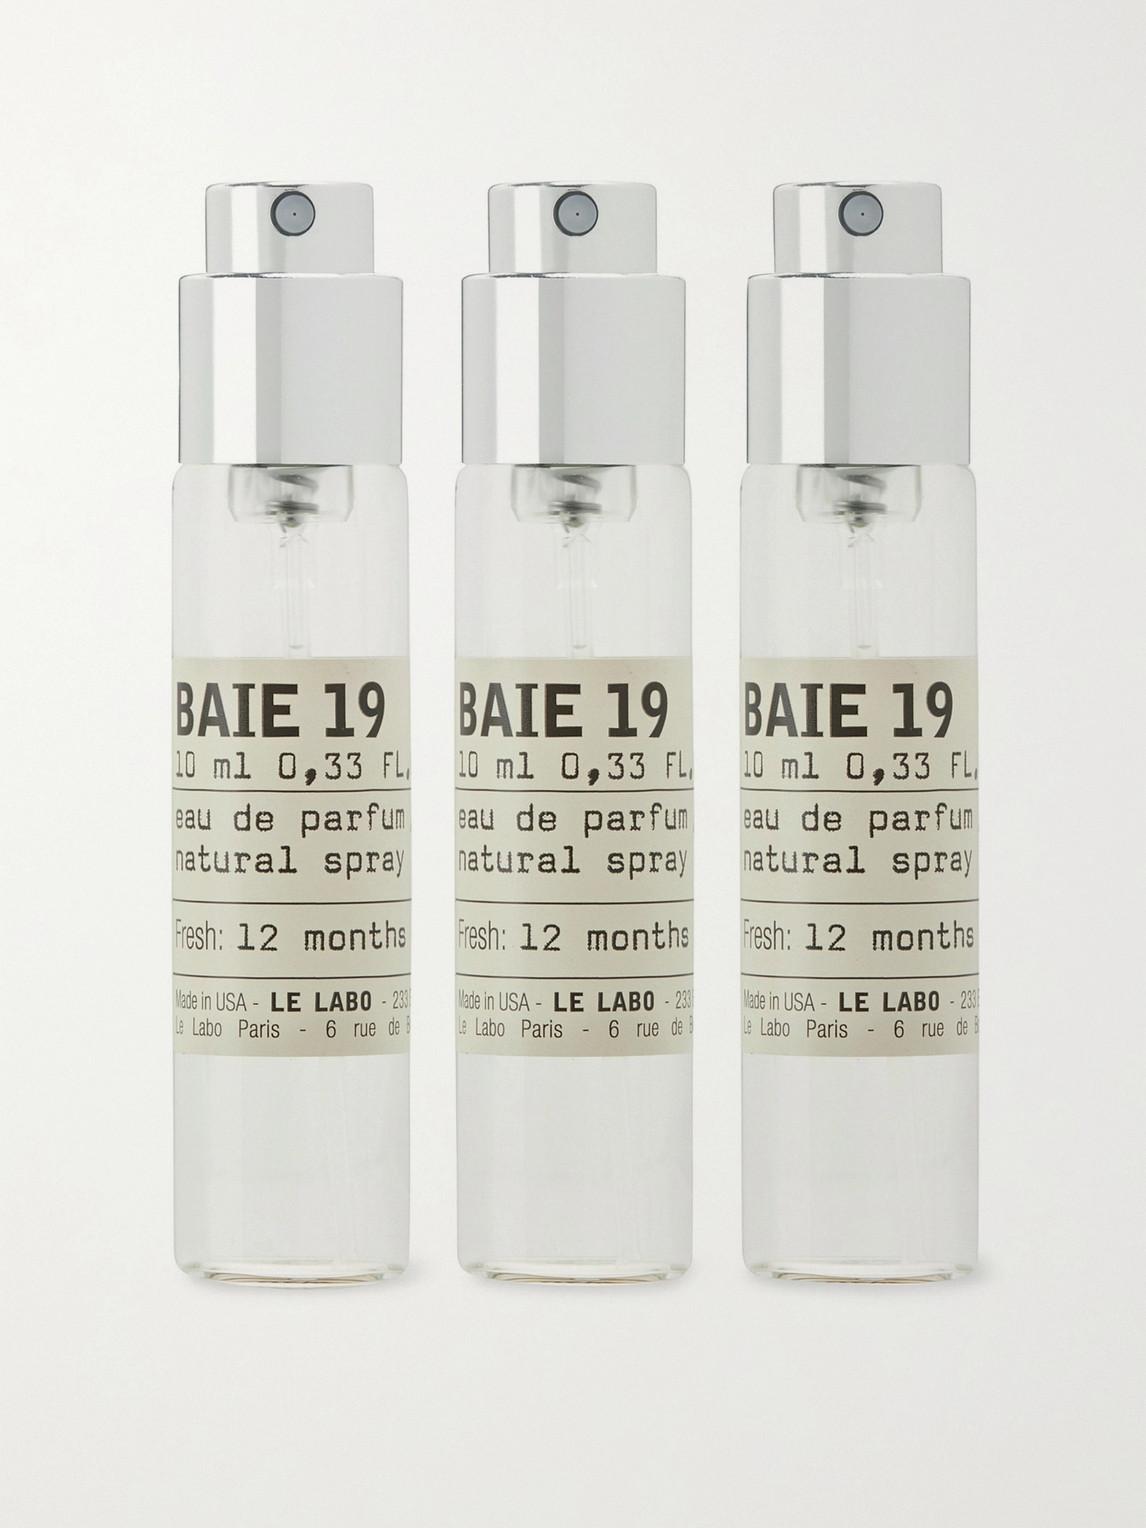 Le Labo Baie 19 Eau De Parfum Travel Tube Refills, 3 X 10ml In Colorless